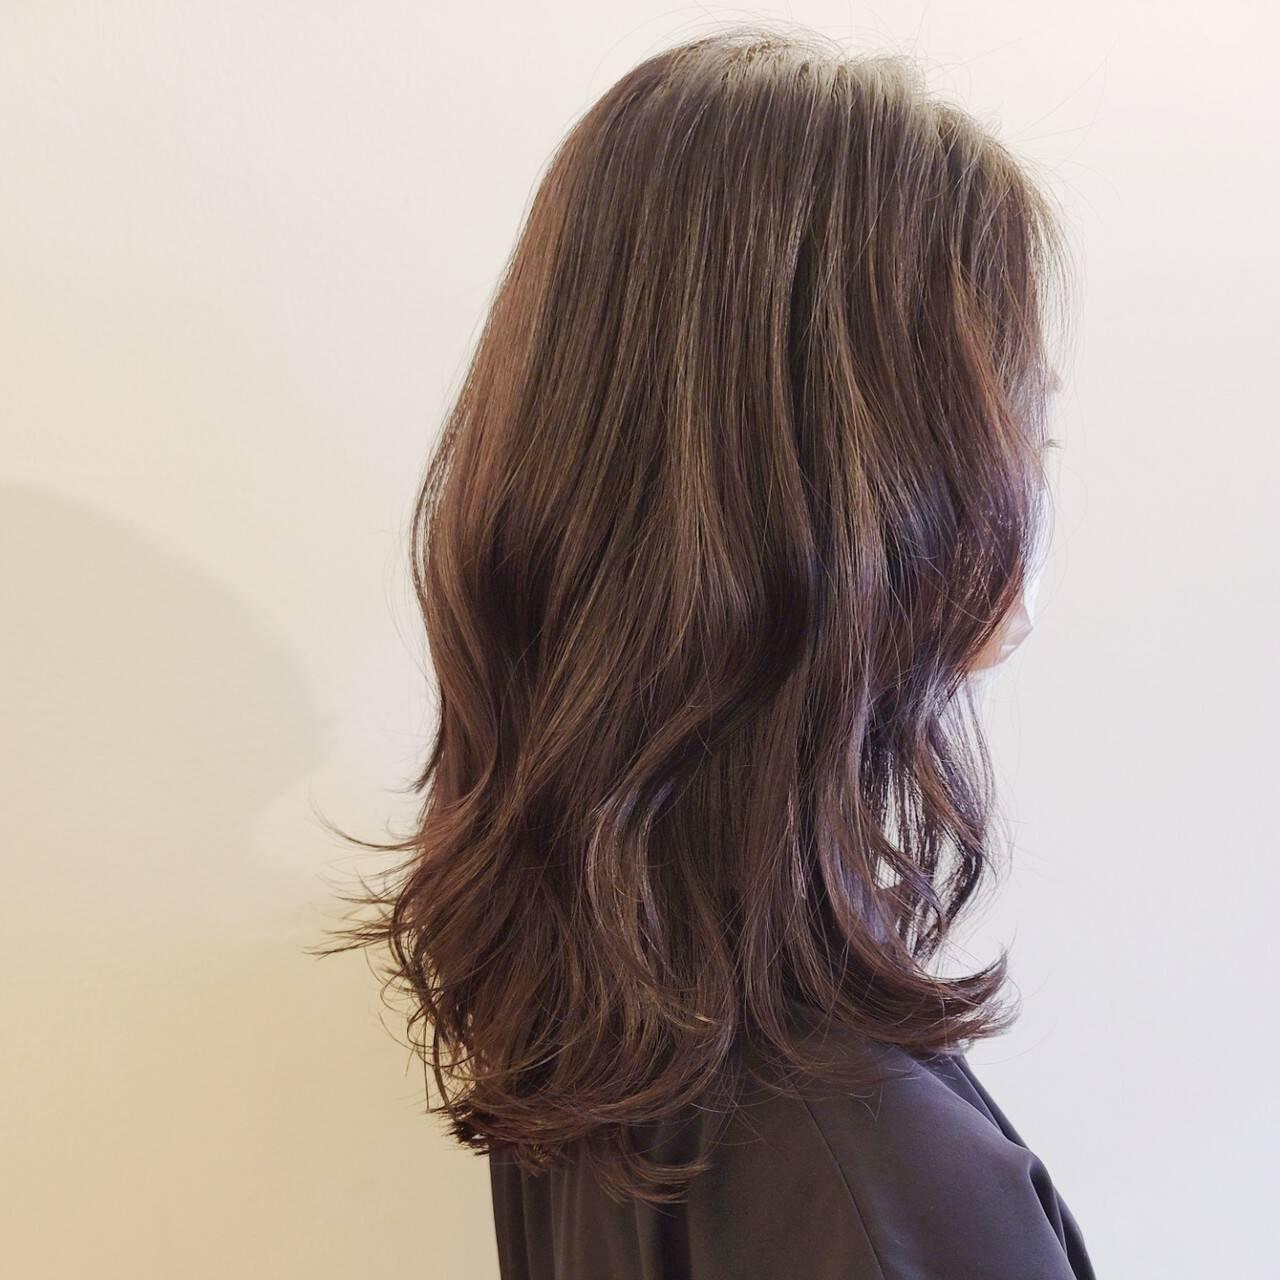 TOKIOトリートメント 大人女子 セミロング 最新トリートメントヘアスタイルや髪型の写真・画像